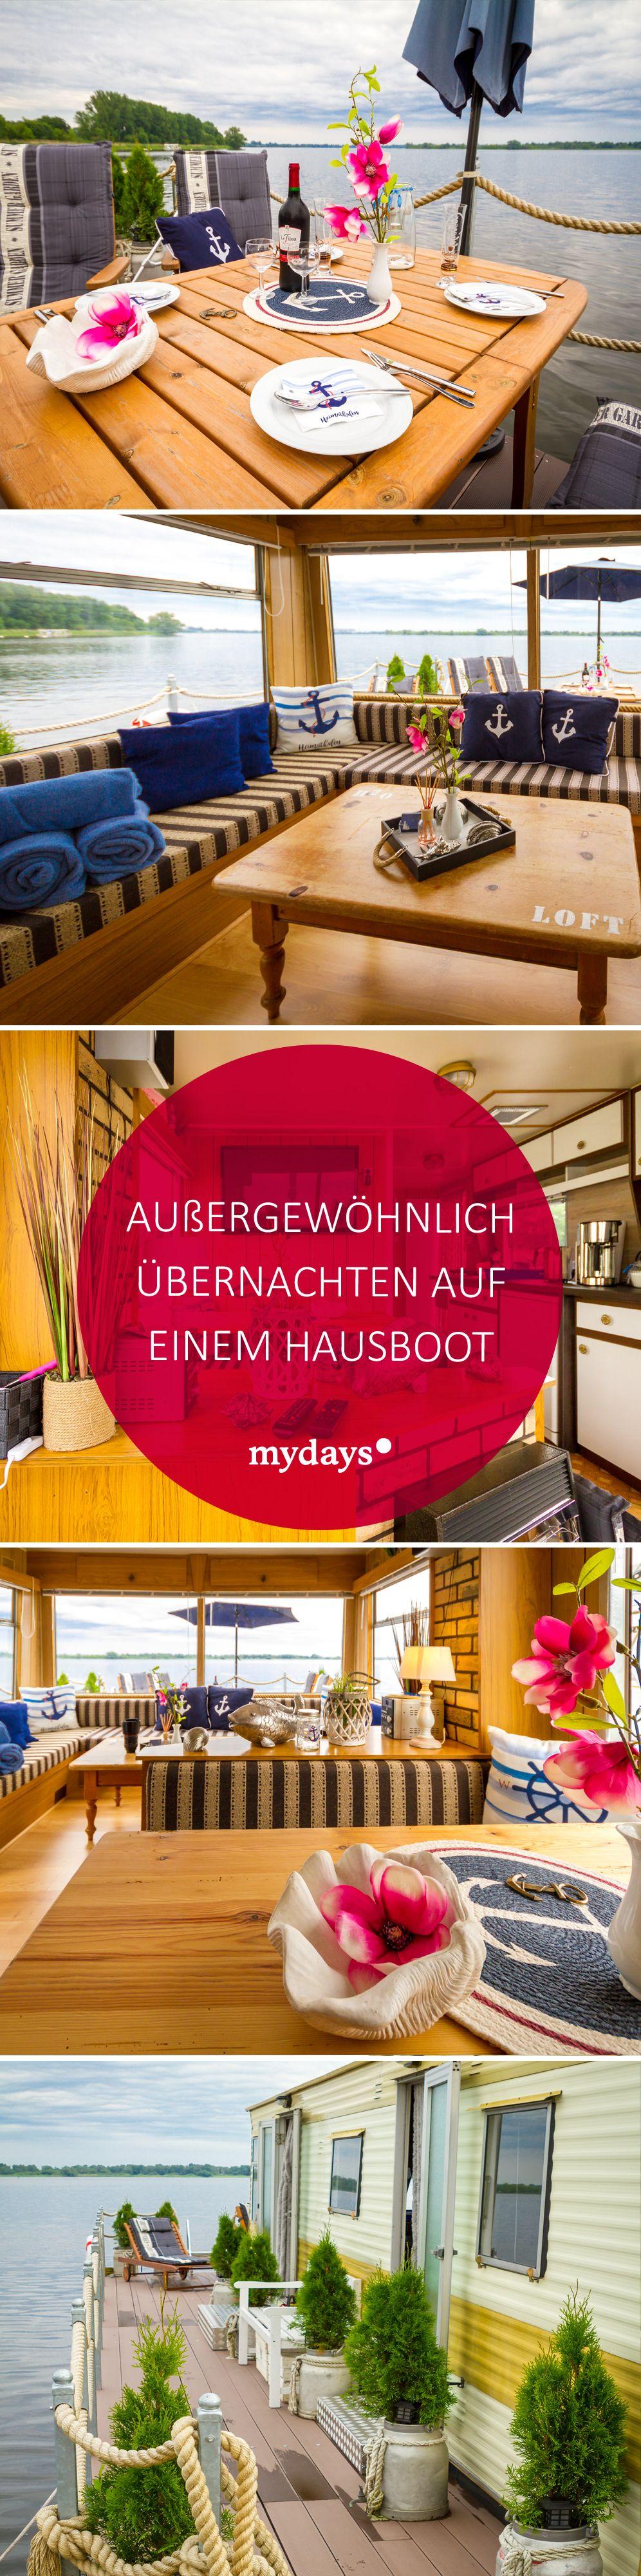 Hausboot Ubernachtung In Brandenburg An Der Havel Mydays Hausboot Ubernachtung Reise Inspiration